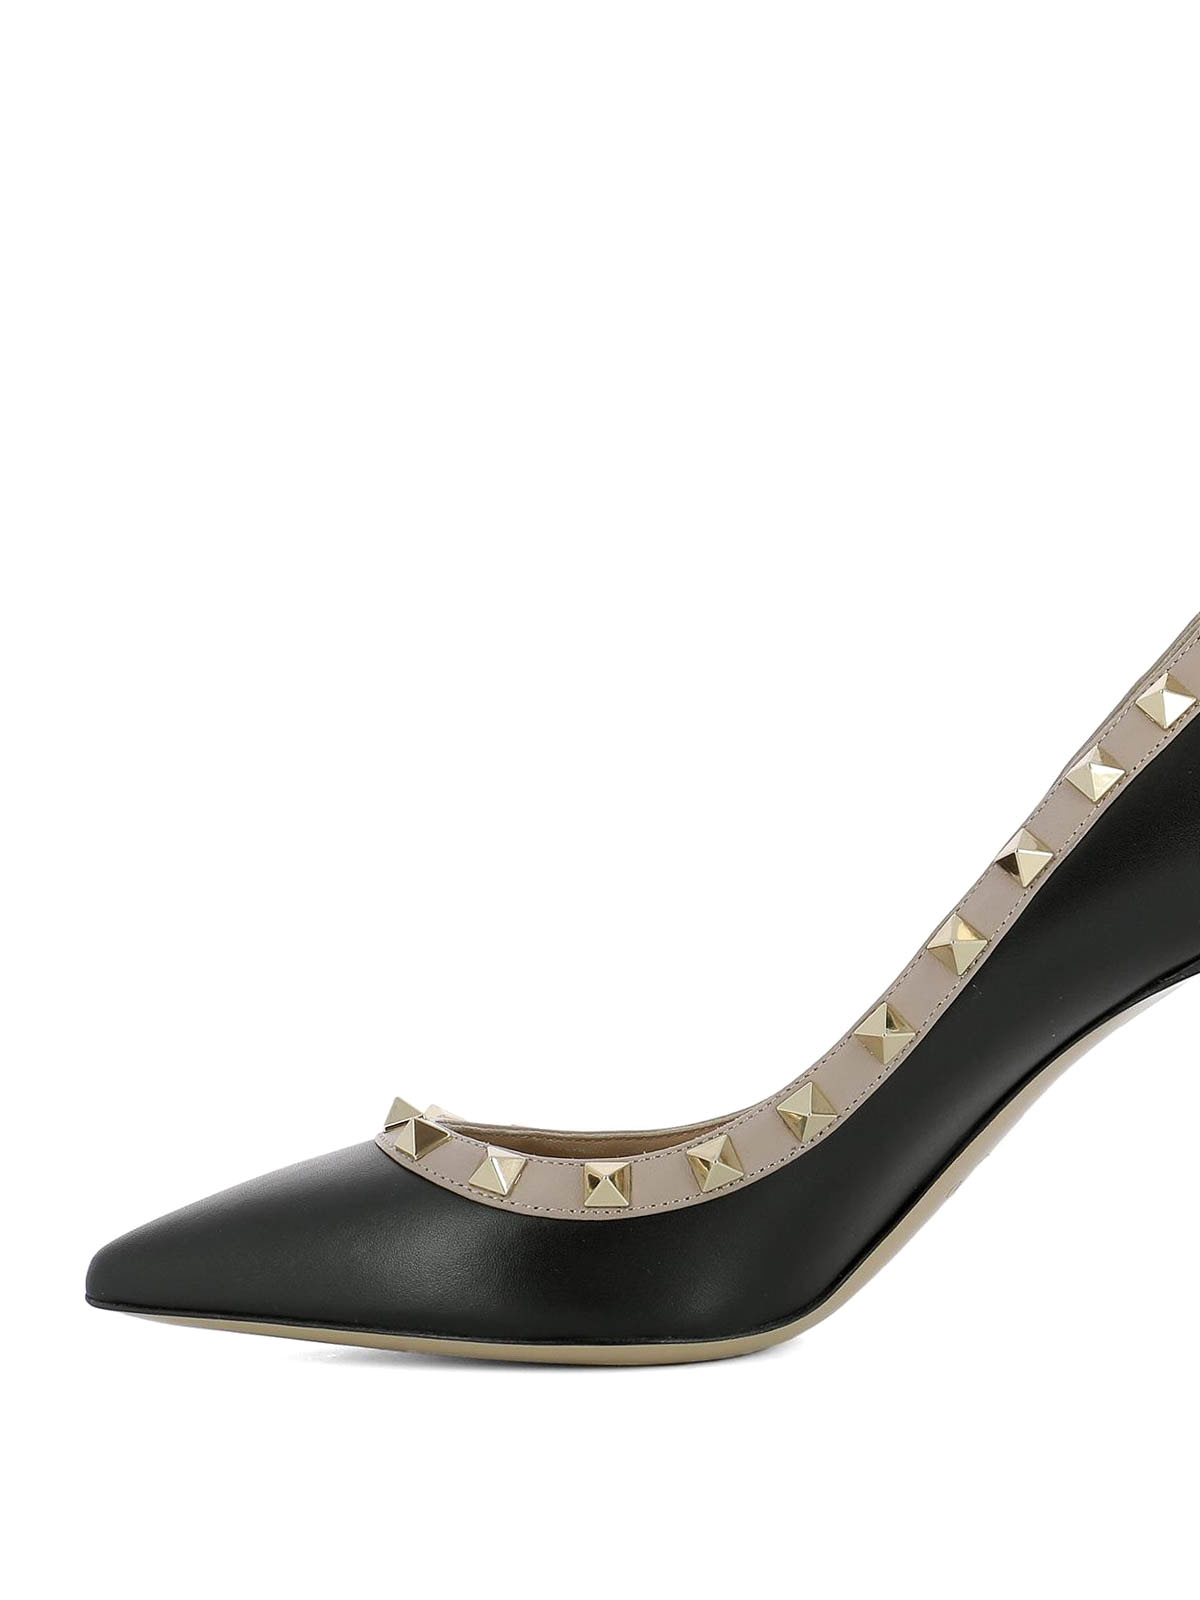 c02fa4d4ee5 iKRIX VALENTINO GARAVANI  court shoes - Rockstud black leather pumps